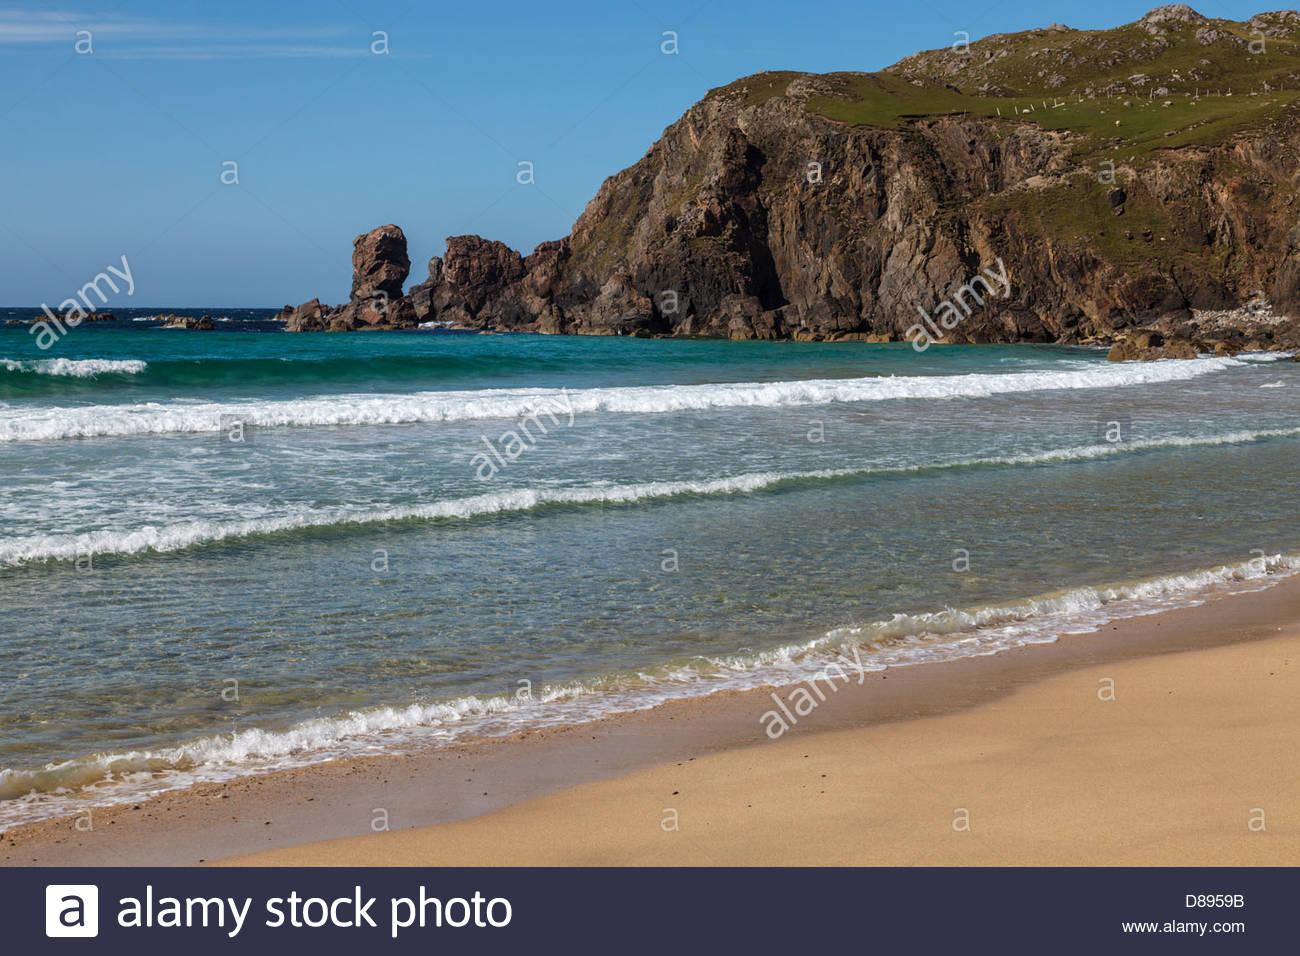 Dalmore Bay (Bhag Dhail Mór), Isle of Lewis, Outer Hebrides, Scotland, United Kingdom - Stock Image